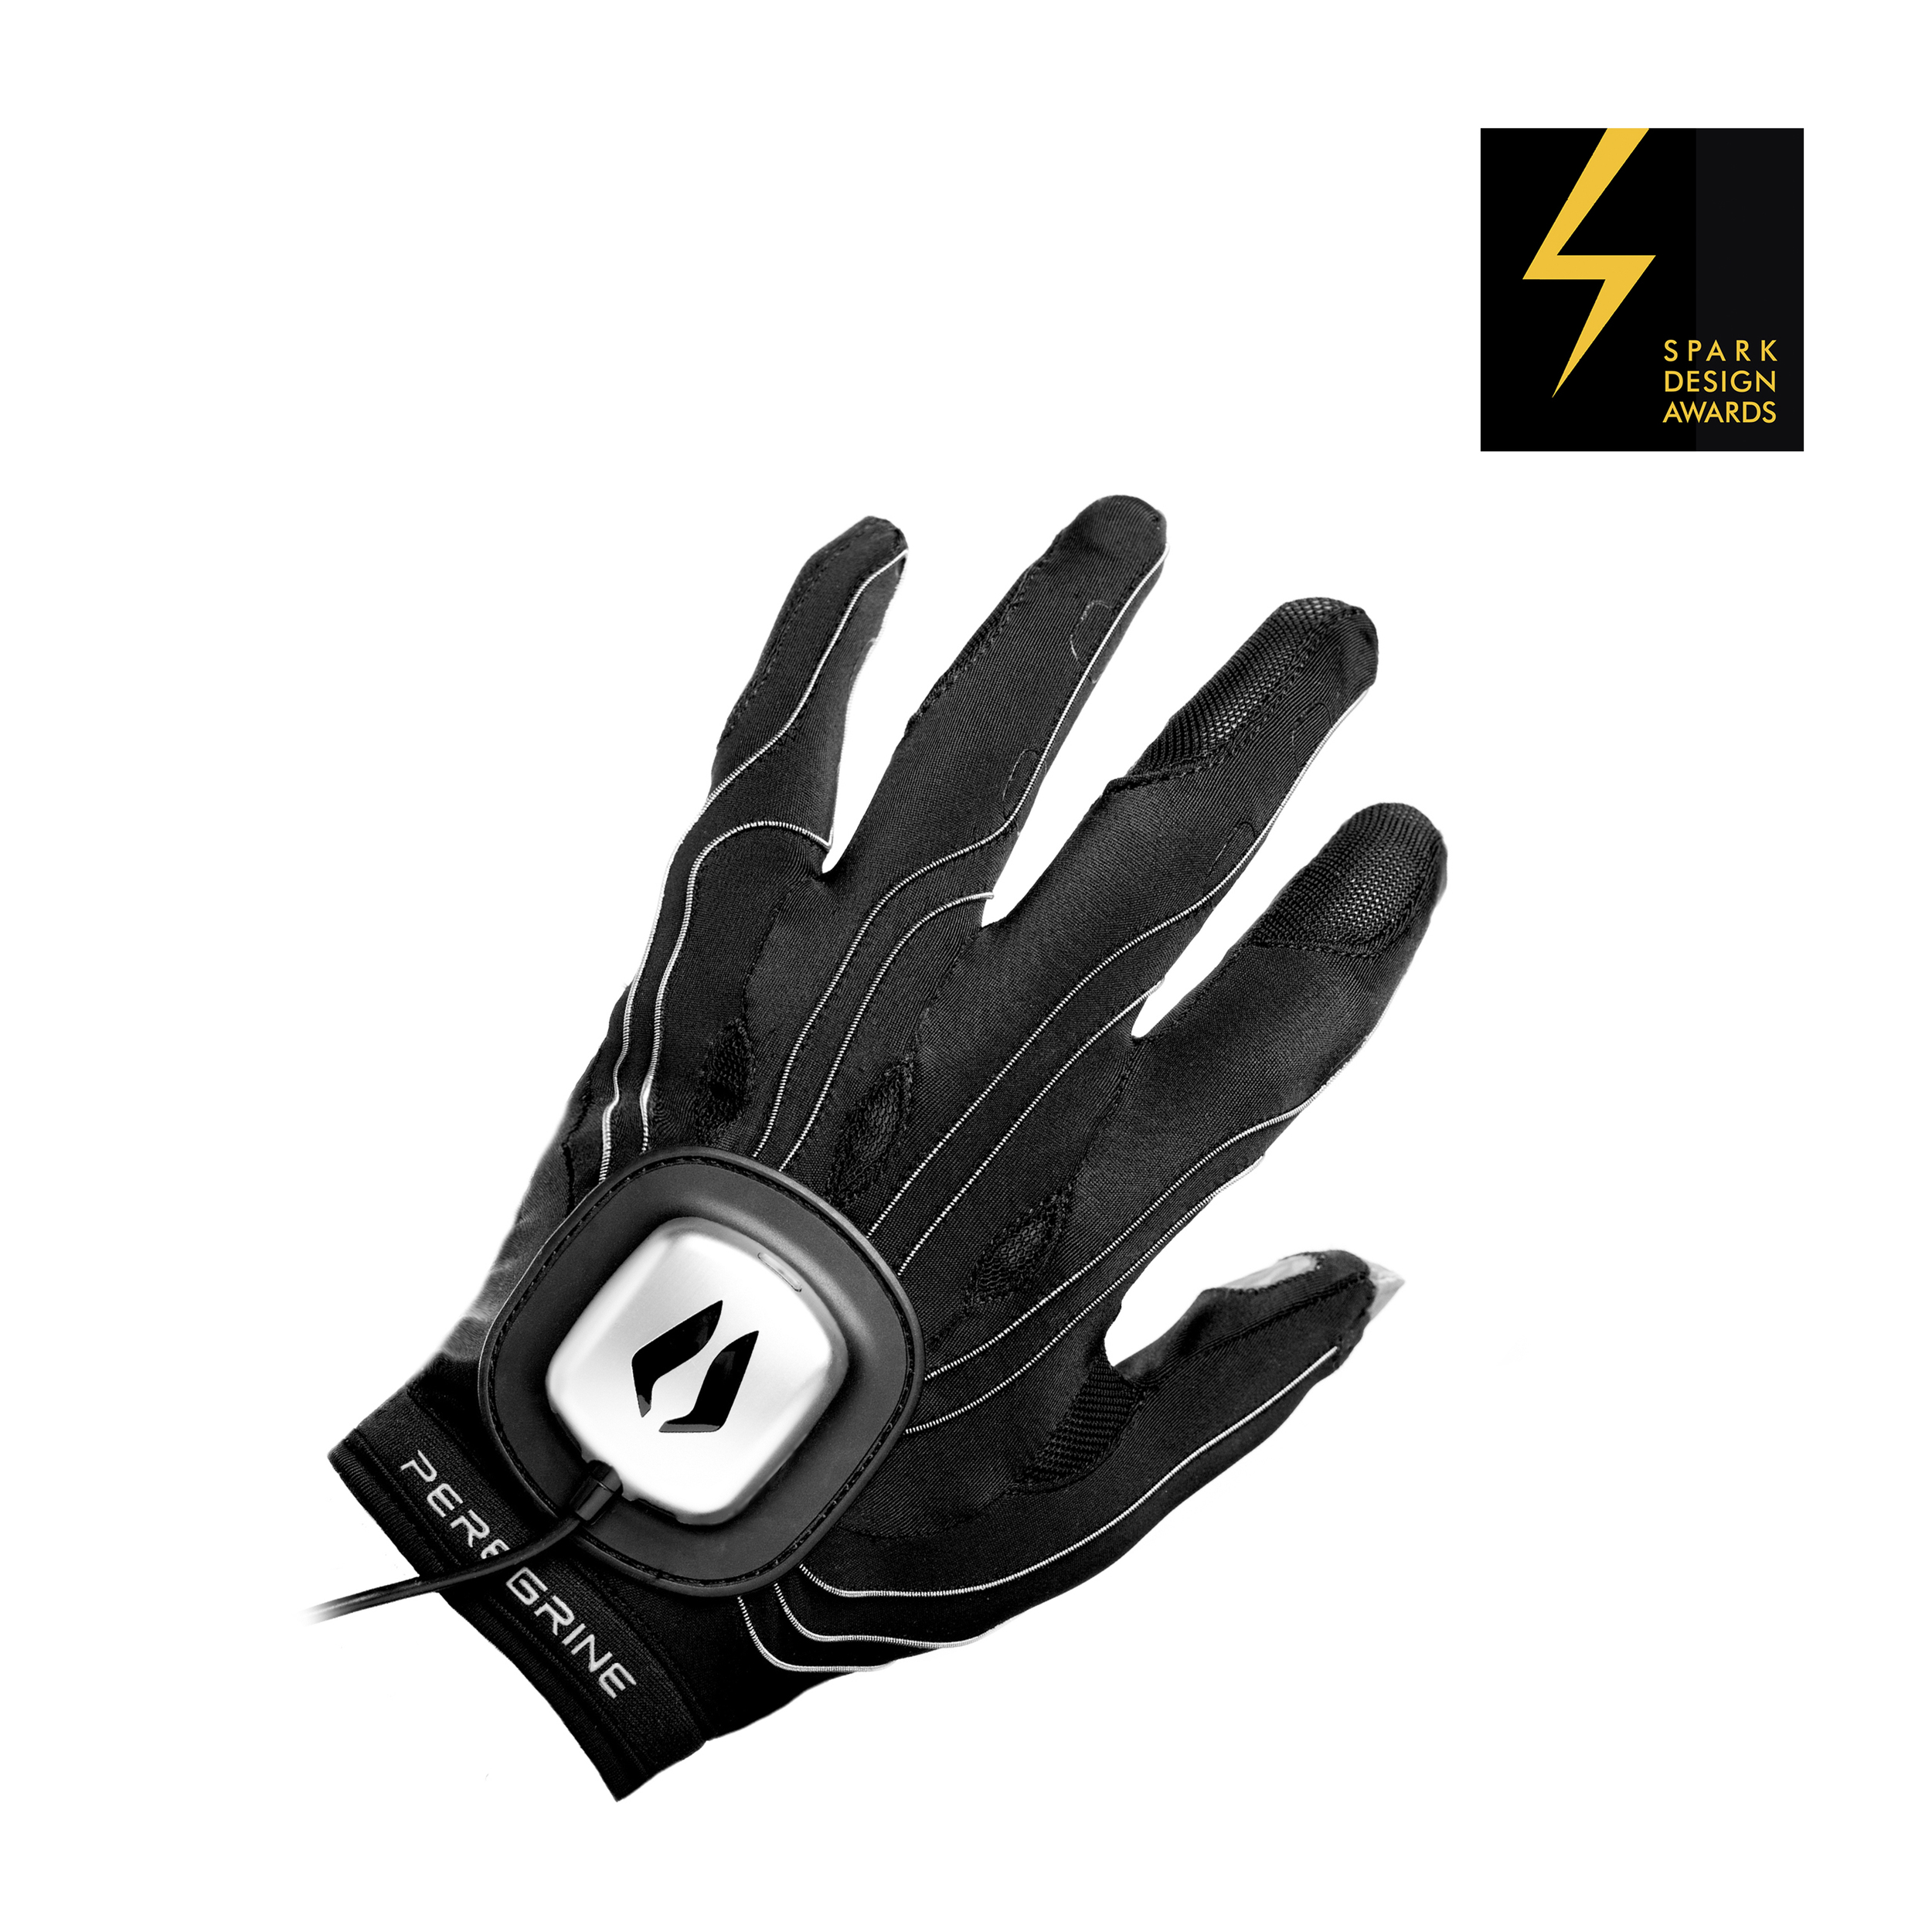 Peregrine Wearable Interface Gaming Glove   Spark Award